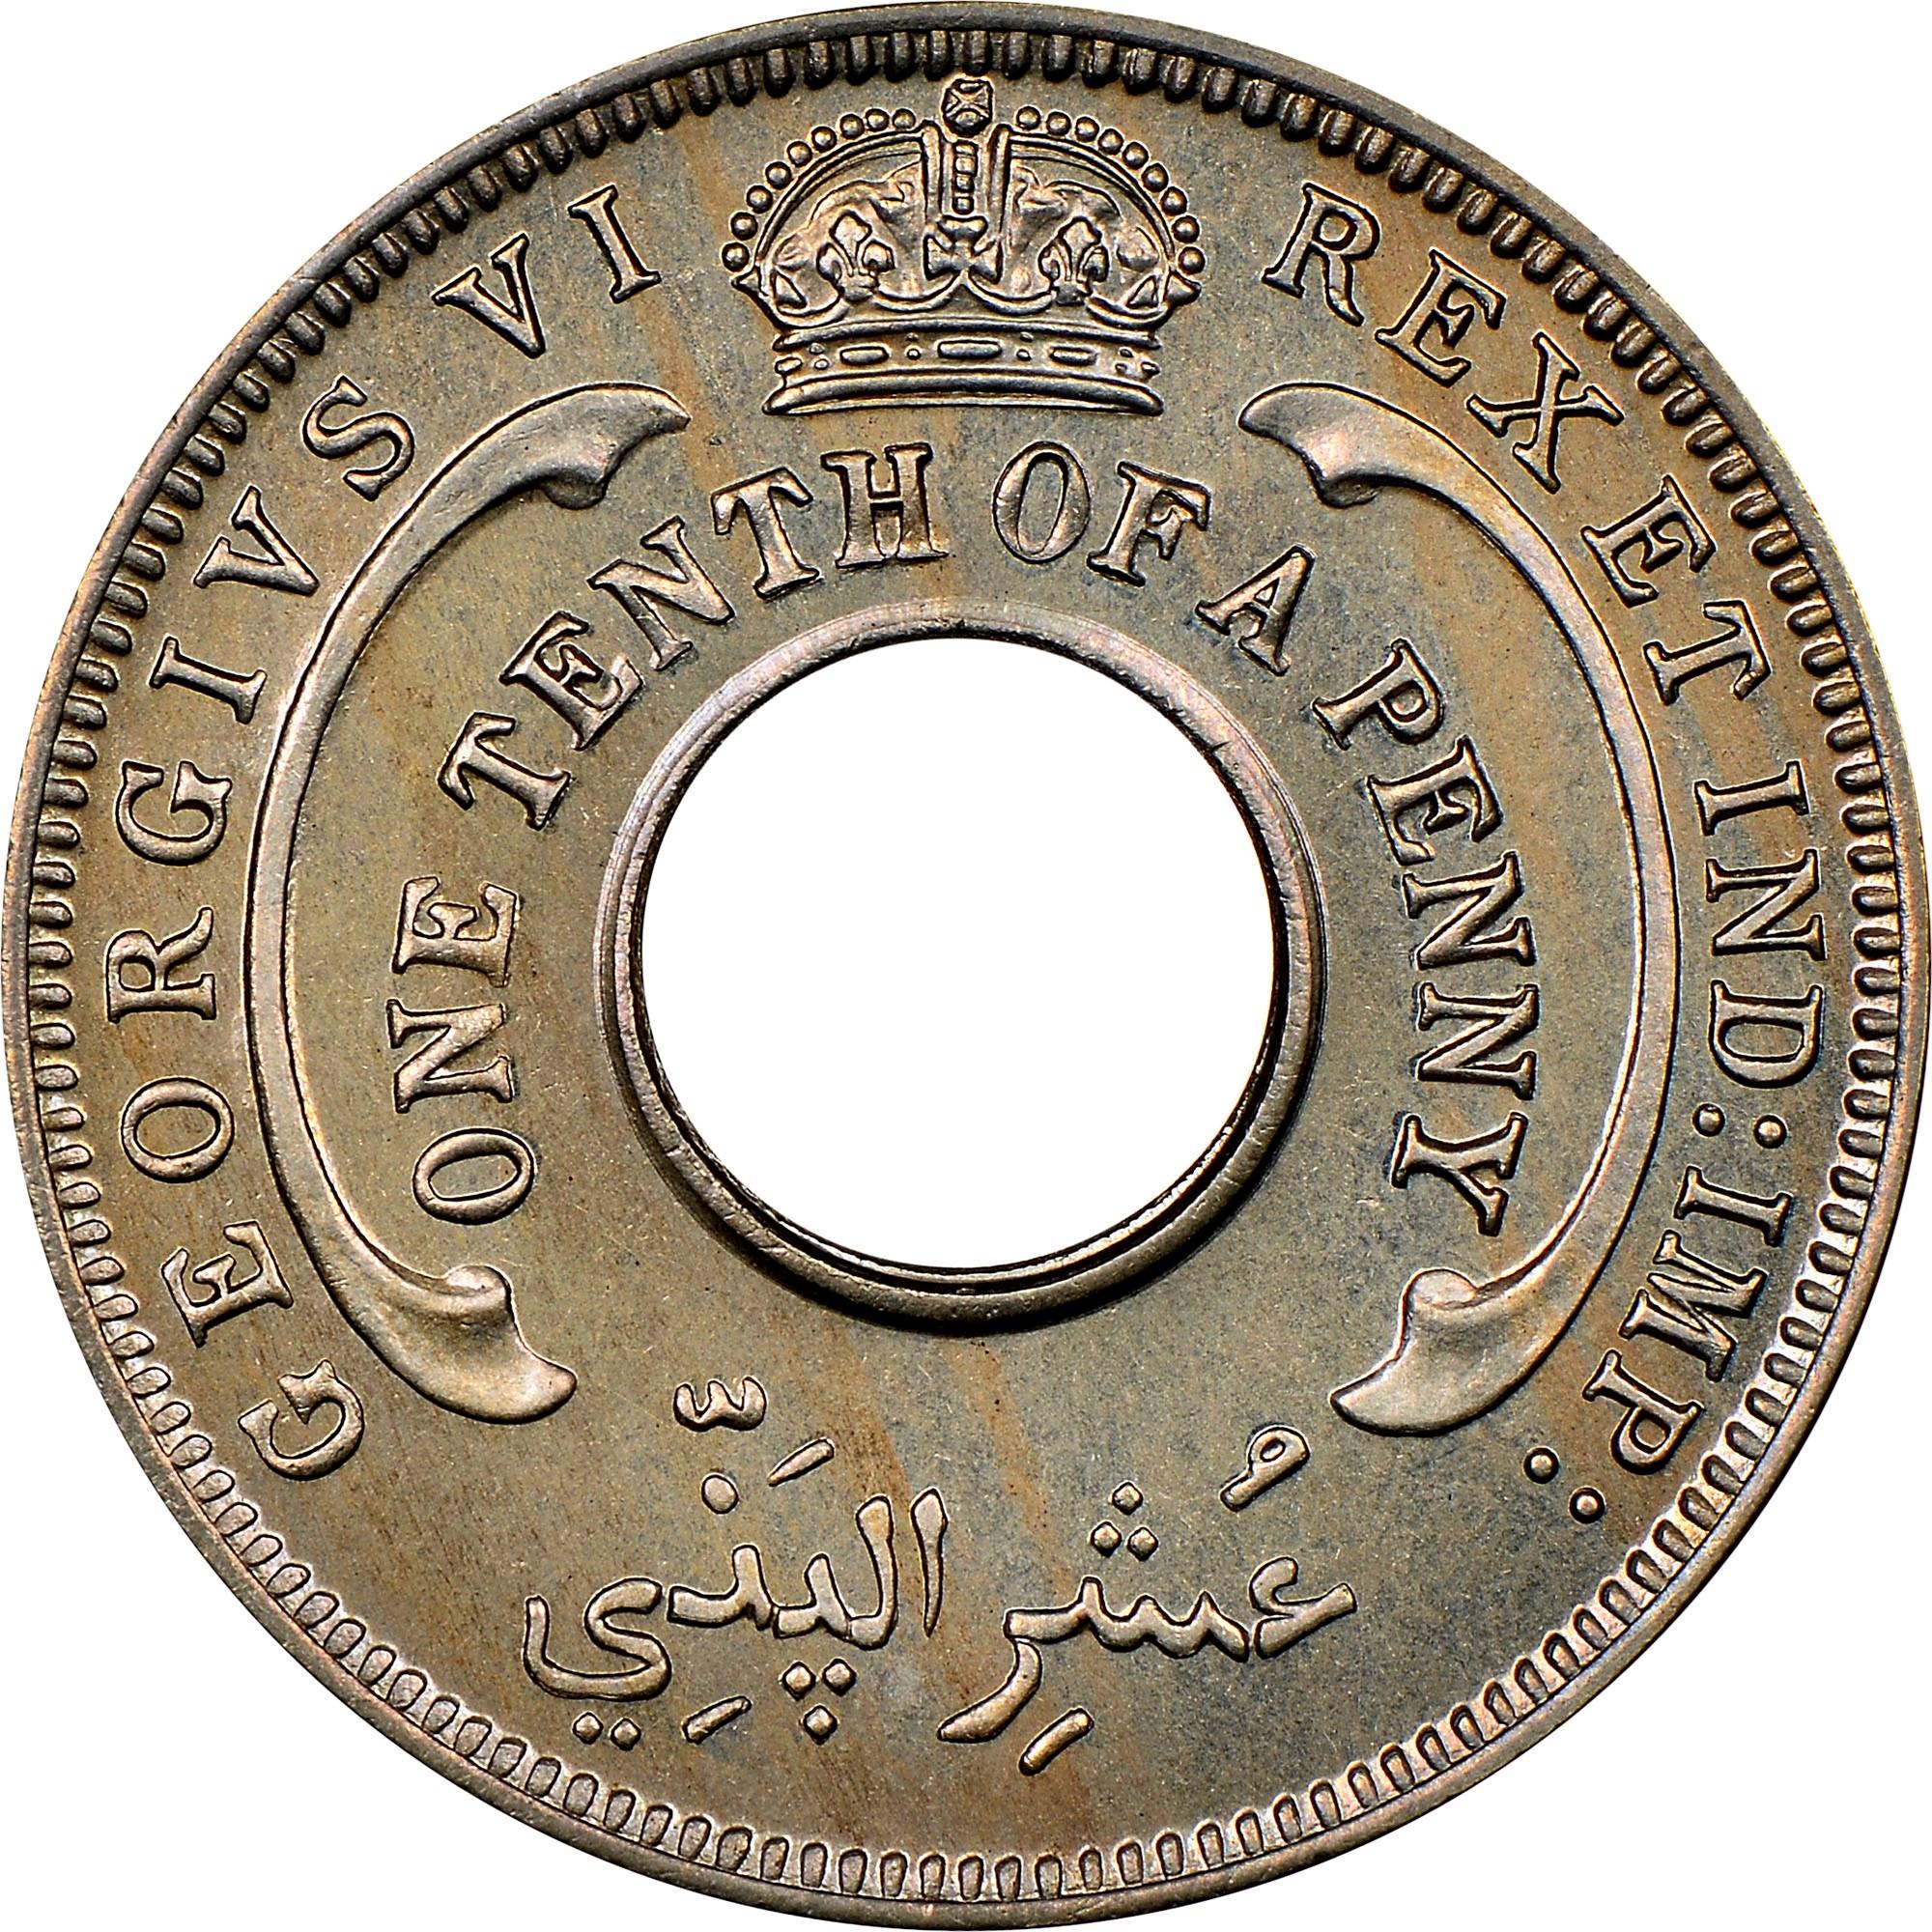 British West Africa 1/10 Penny obverse